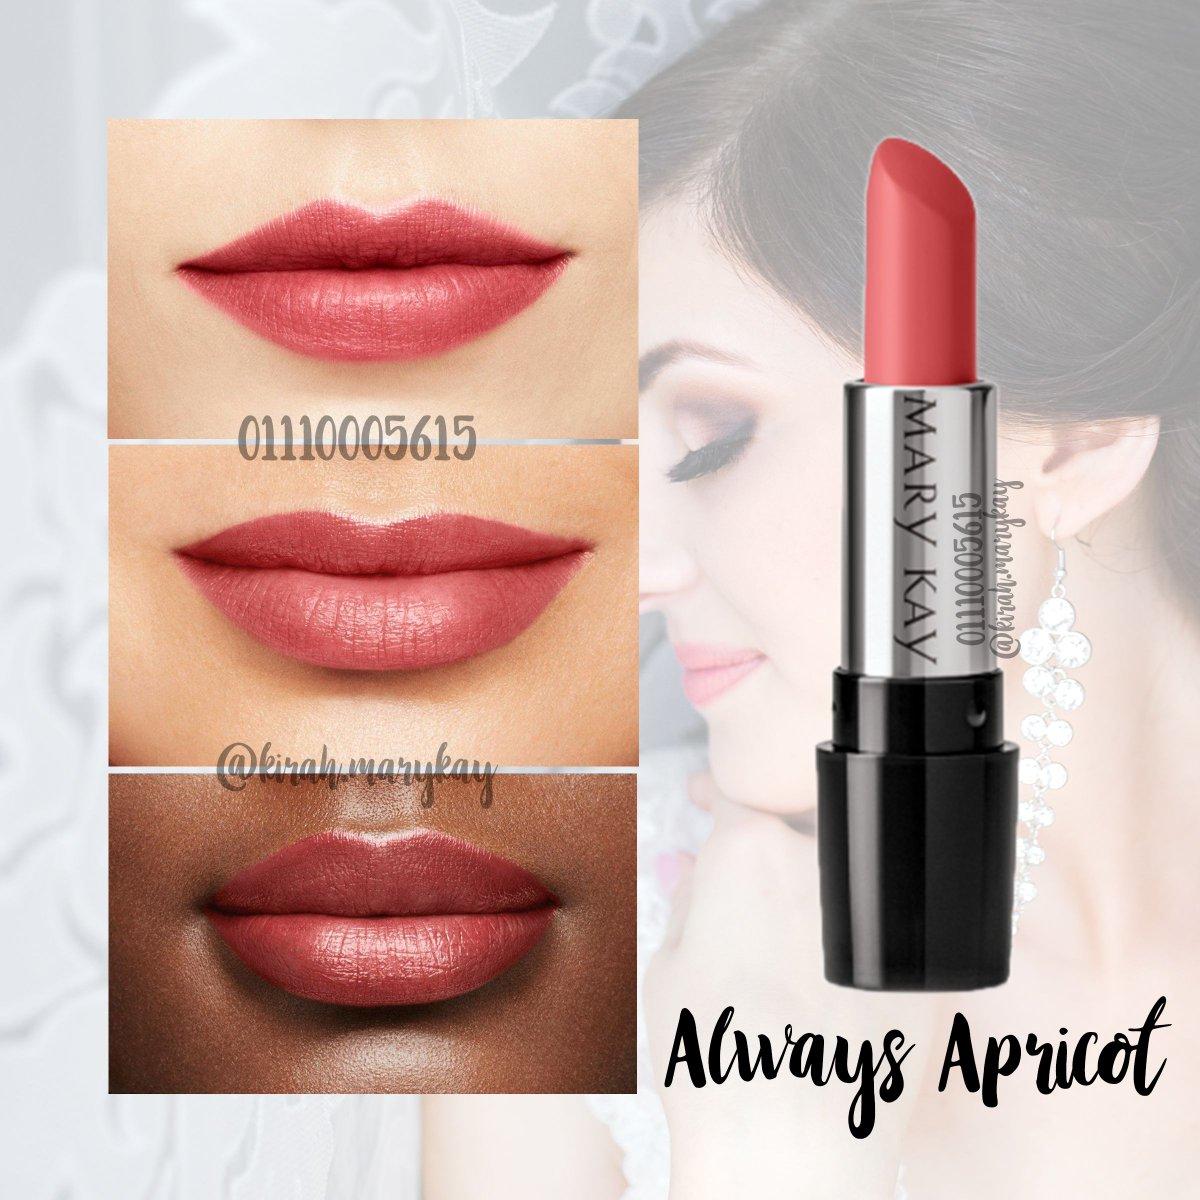 Antara hot item ni.. mmg cantik sgt.. Warna yang simple2 je..  #alwaysapricot #gelsemimatte # lipstick https://buff.ly/2IKyapM (klik disini)pic.twitter.com/5KsTkjKRs6